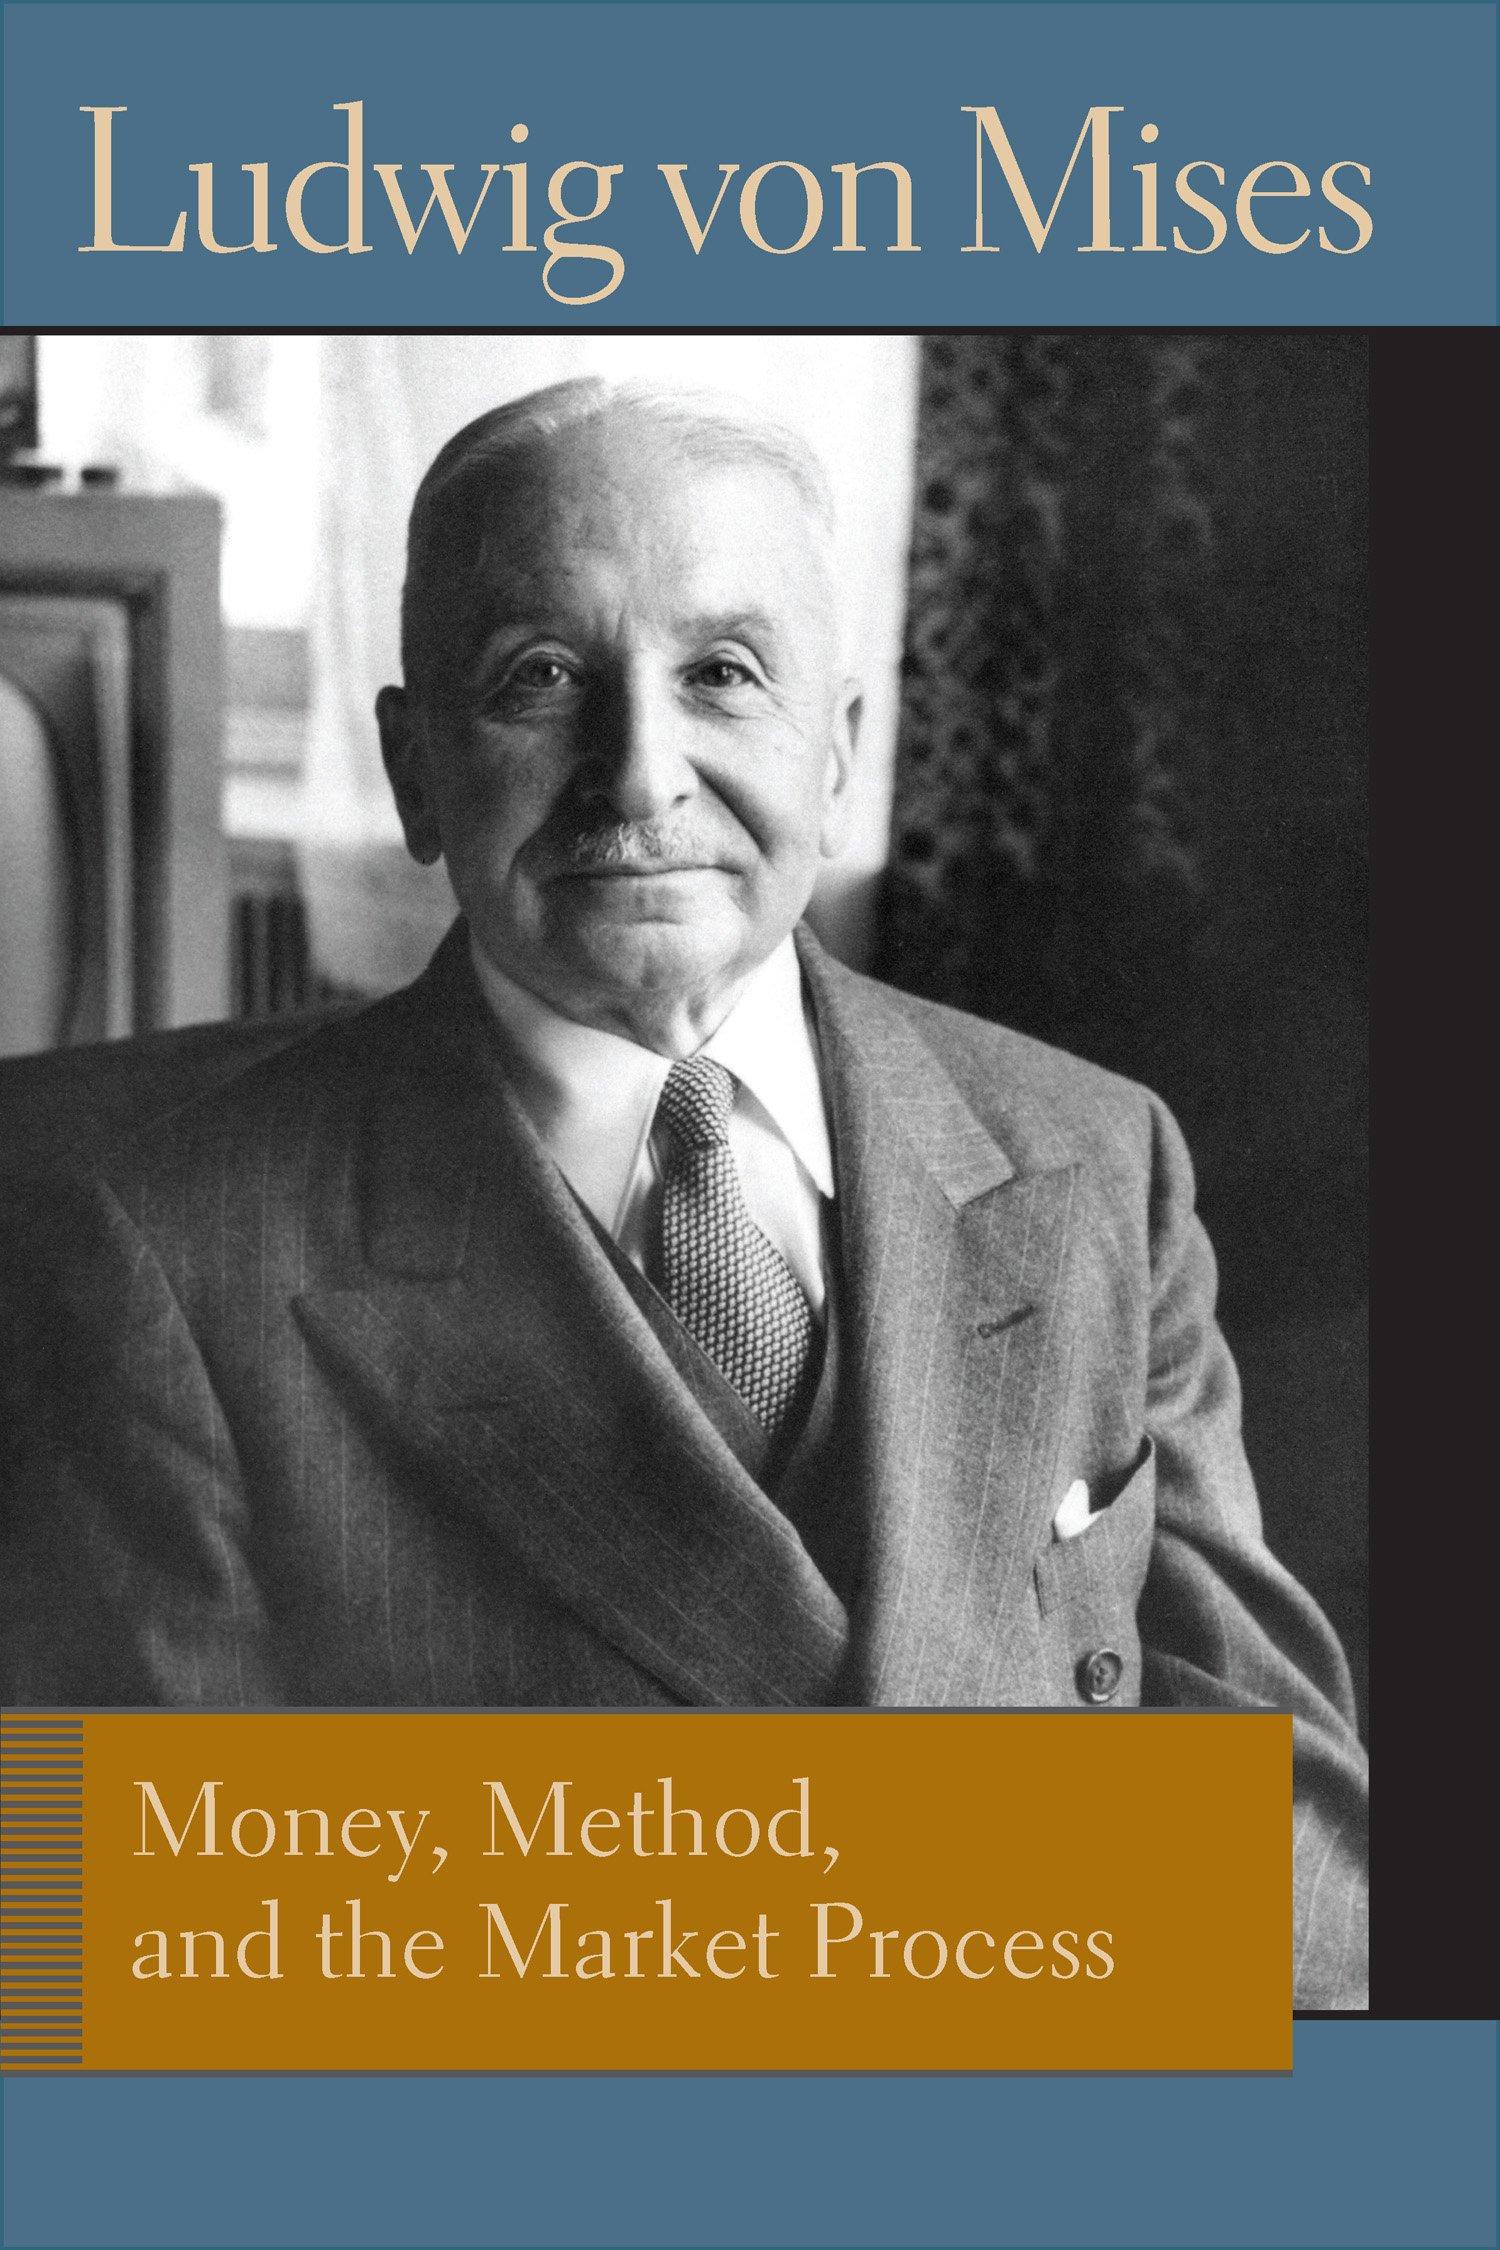 Money, Method, and the Market Process: Essays (Lib Works Ludwig Von Mises Pb) ebook